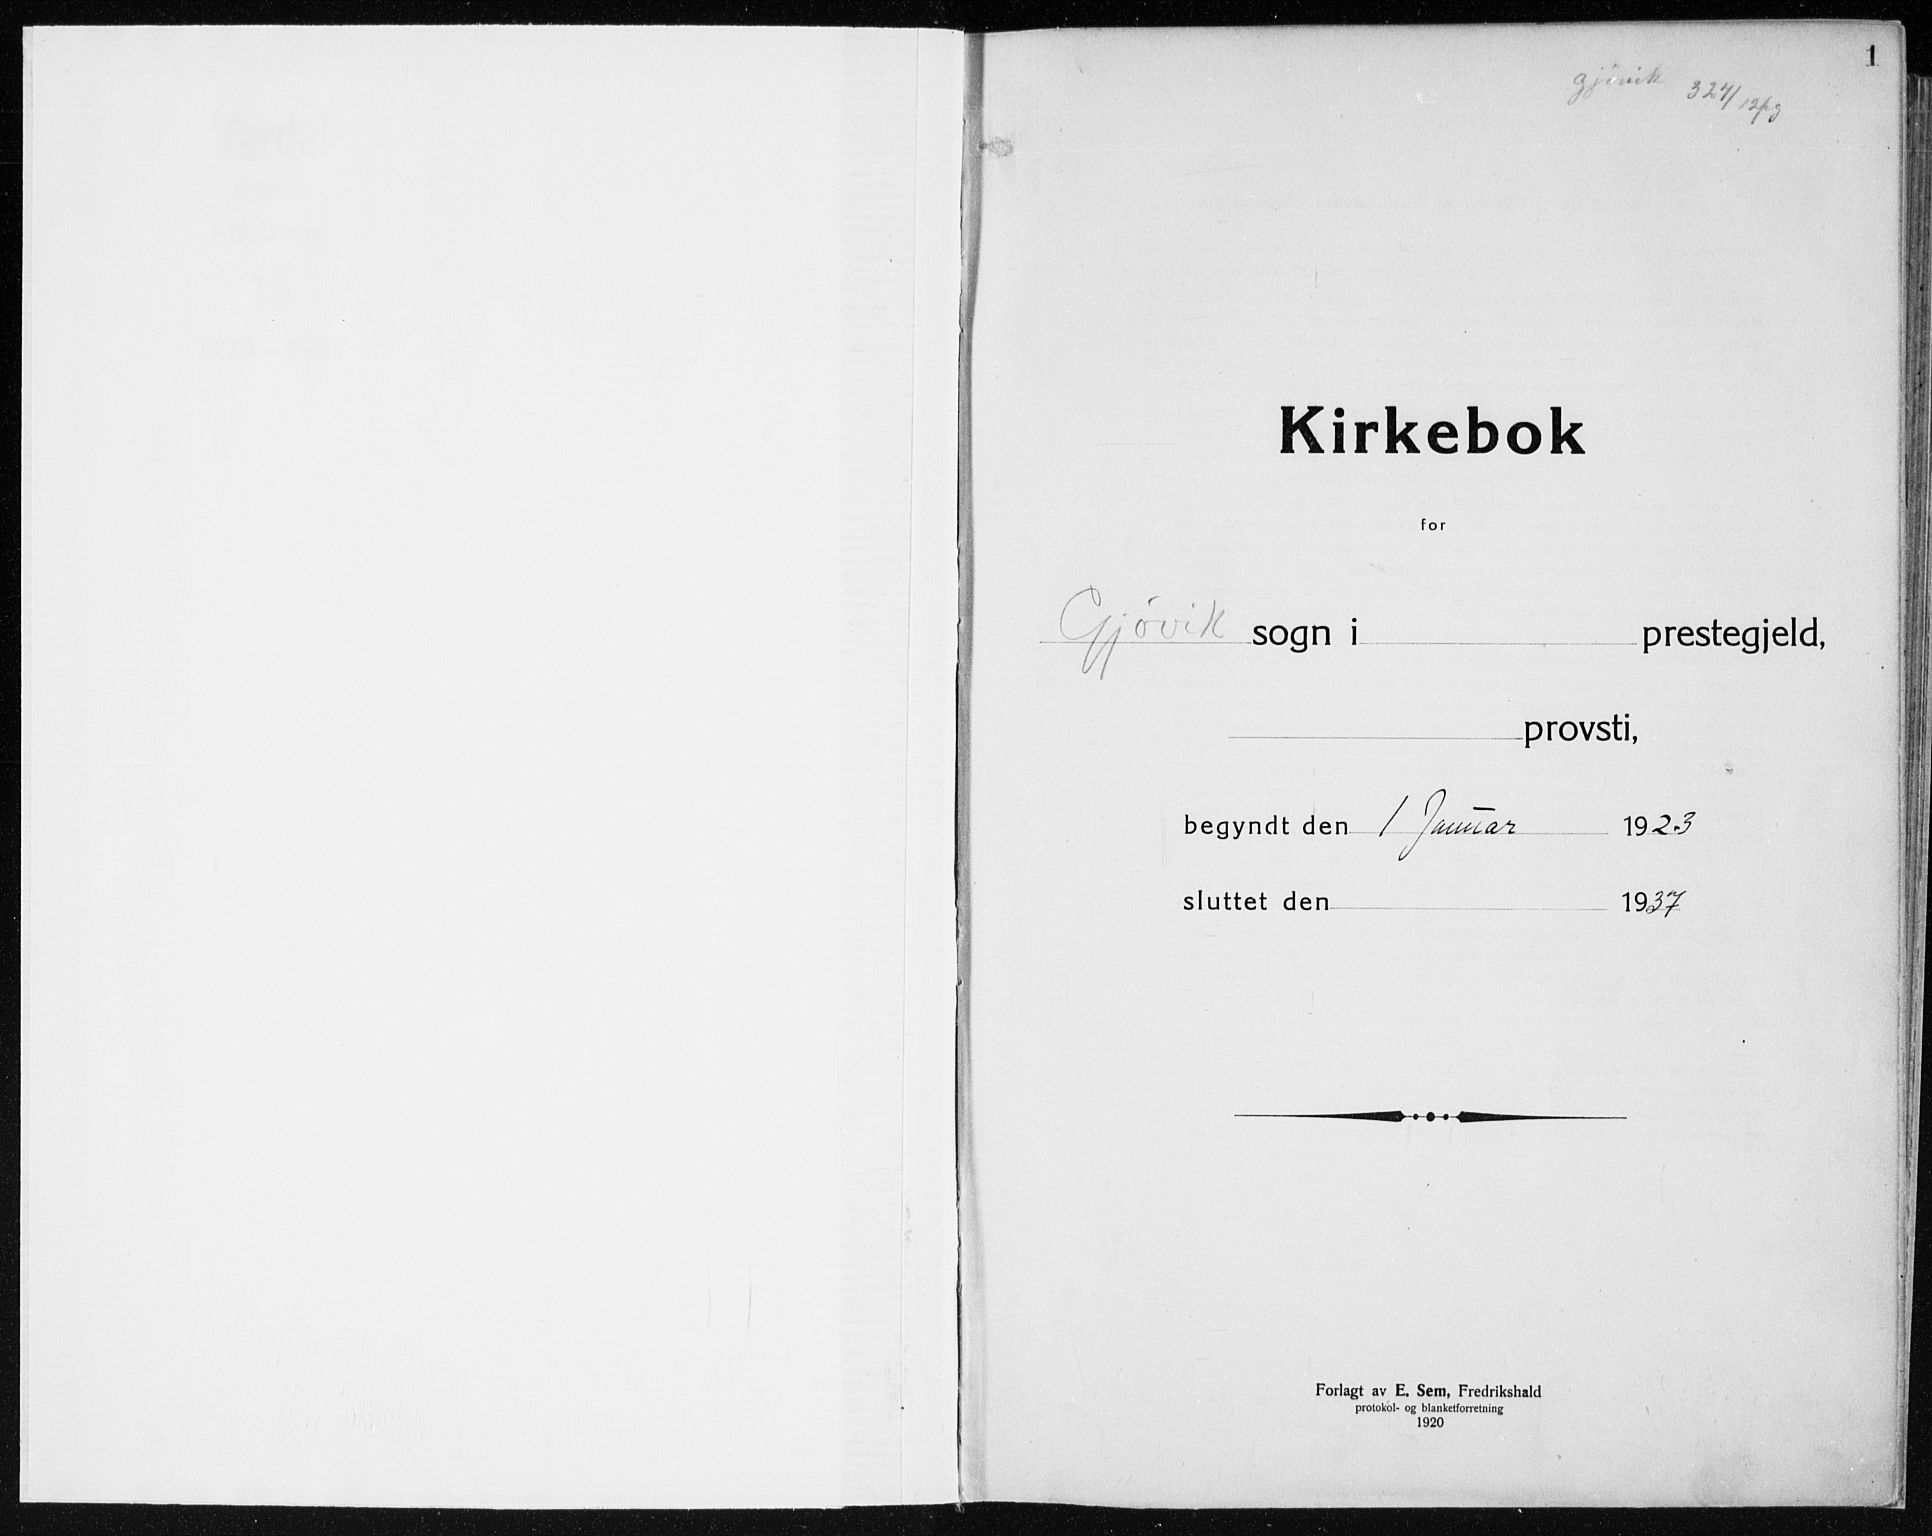 SAH, Vardal prestekontor, H/Ha/Haa/L0015: Ministerialbok nr. 15, 1923-1937, s. 1